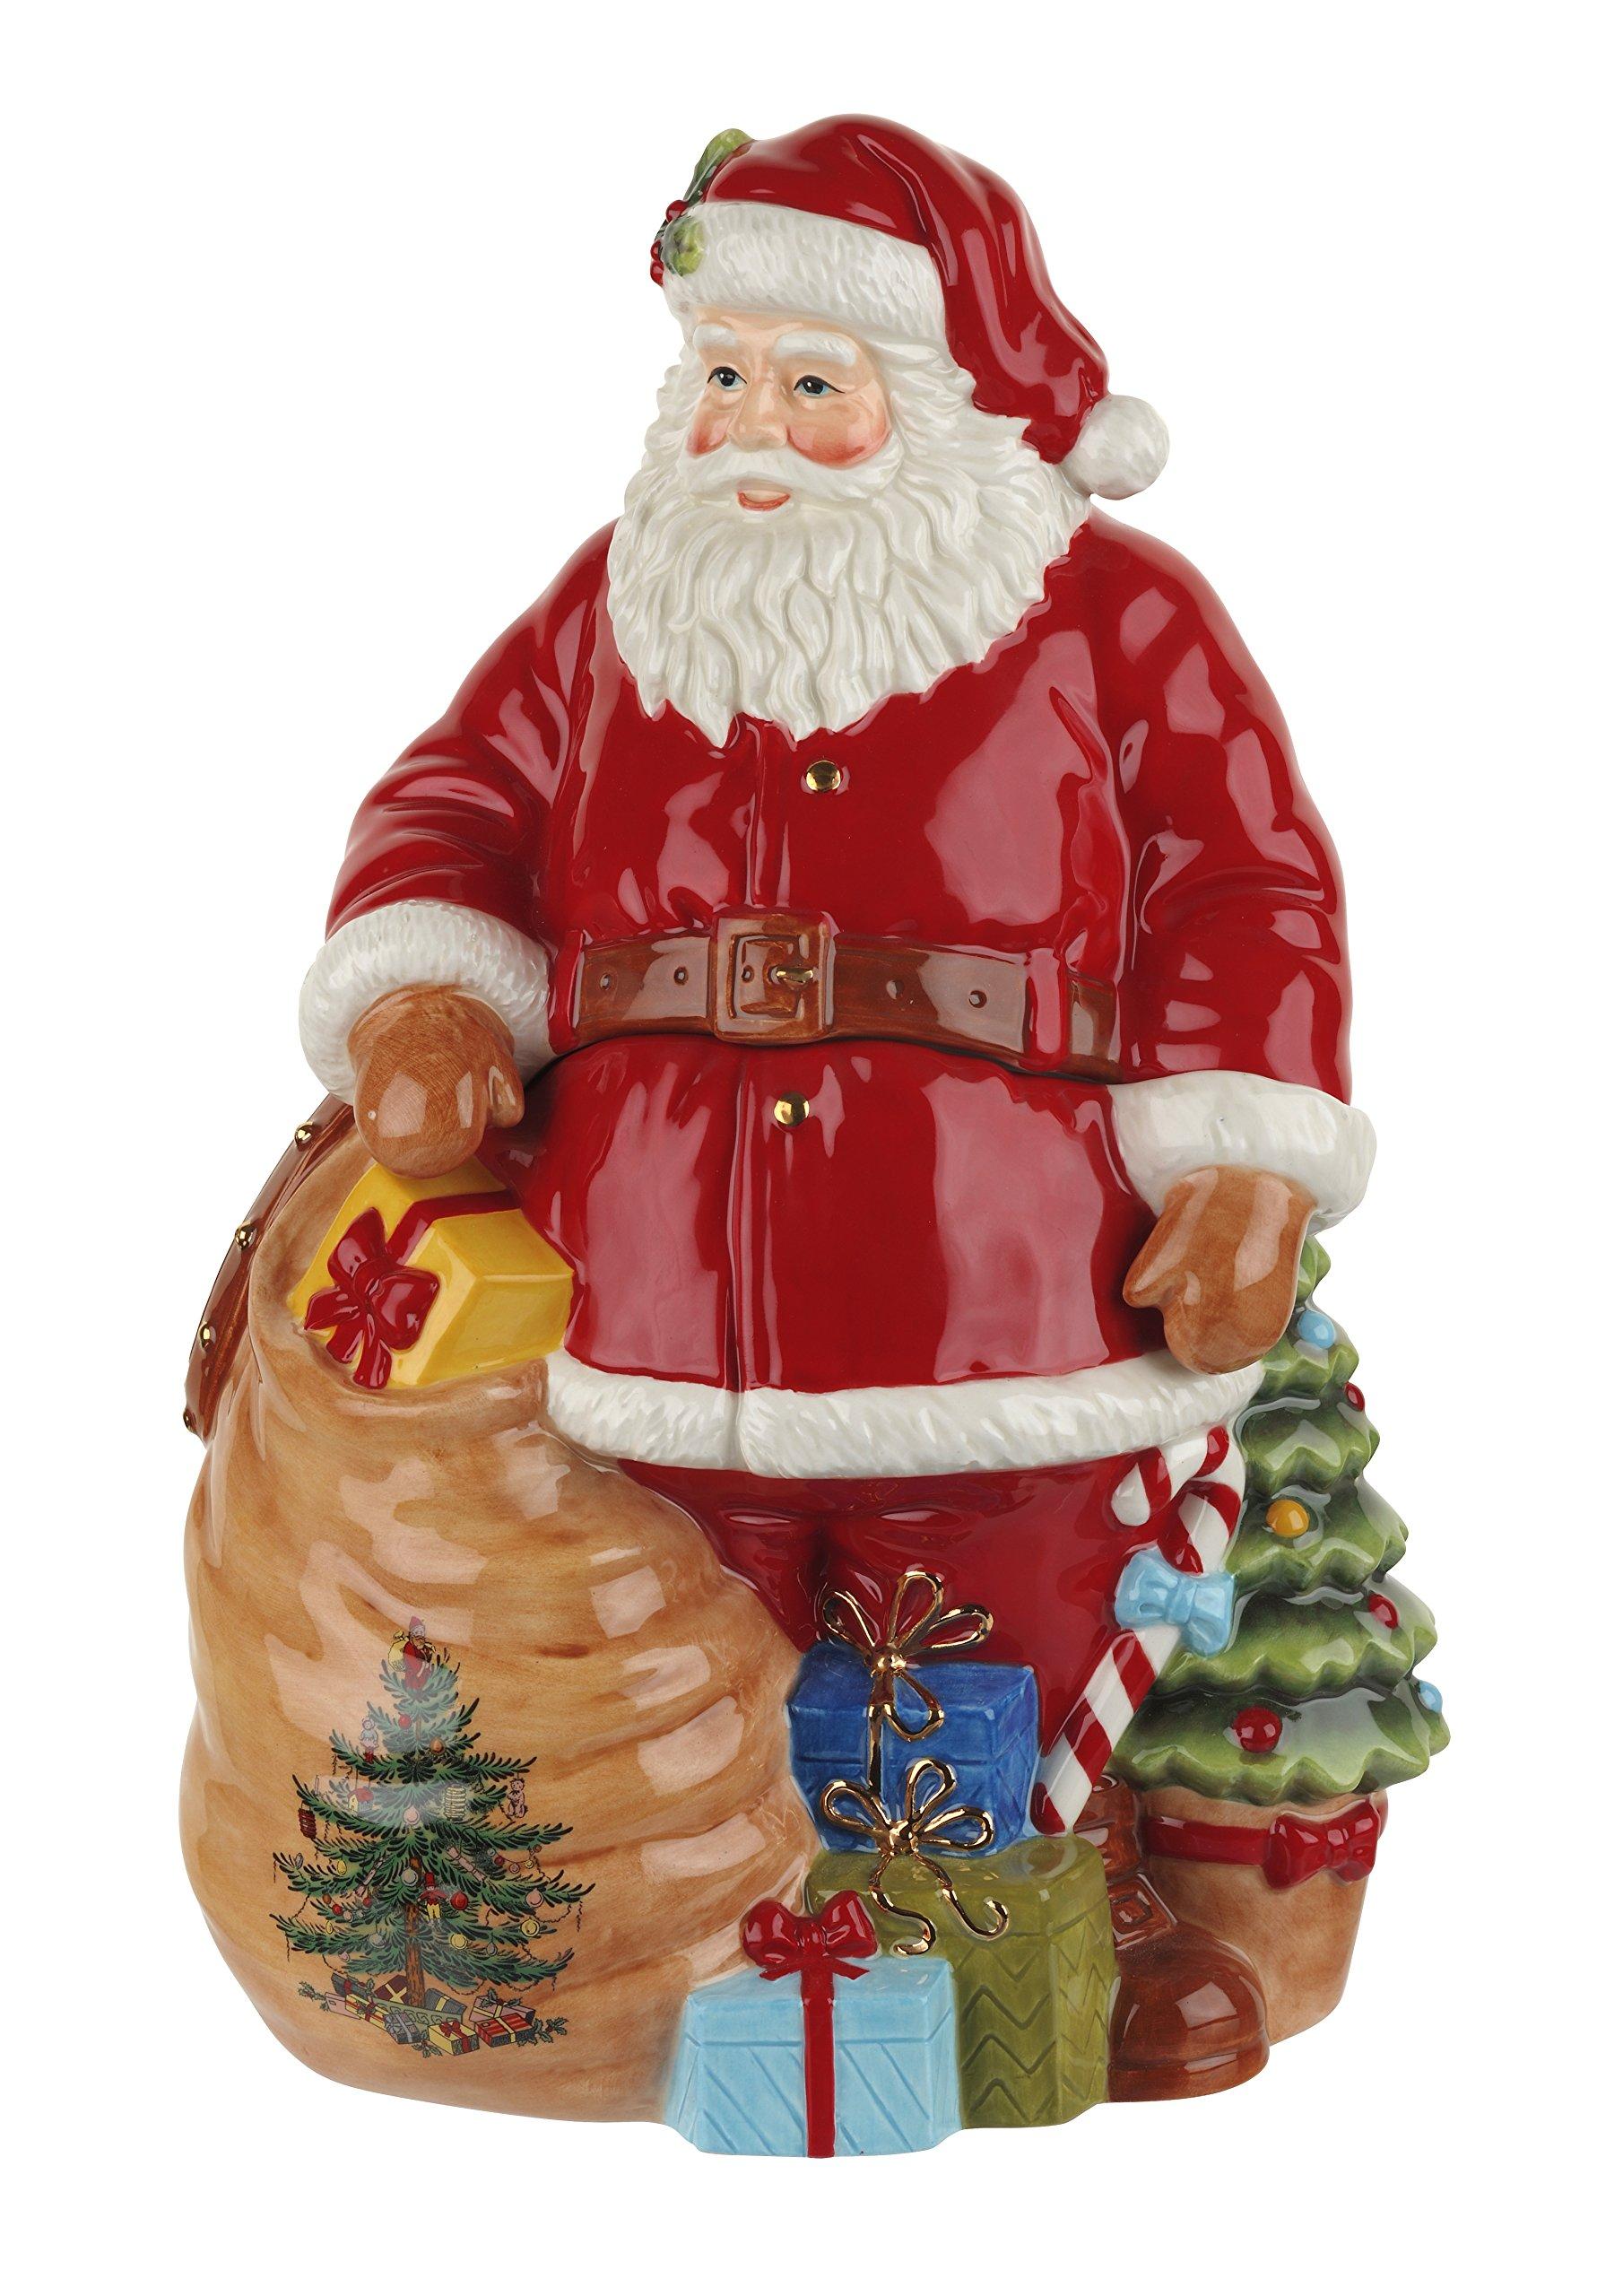 Spode Christmas Tree Santa Cookie Jar